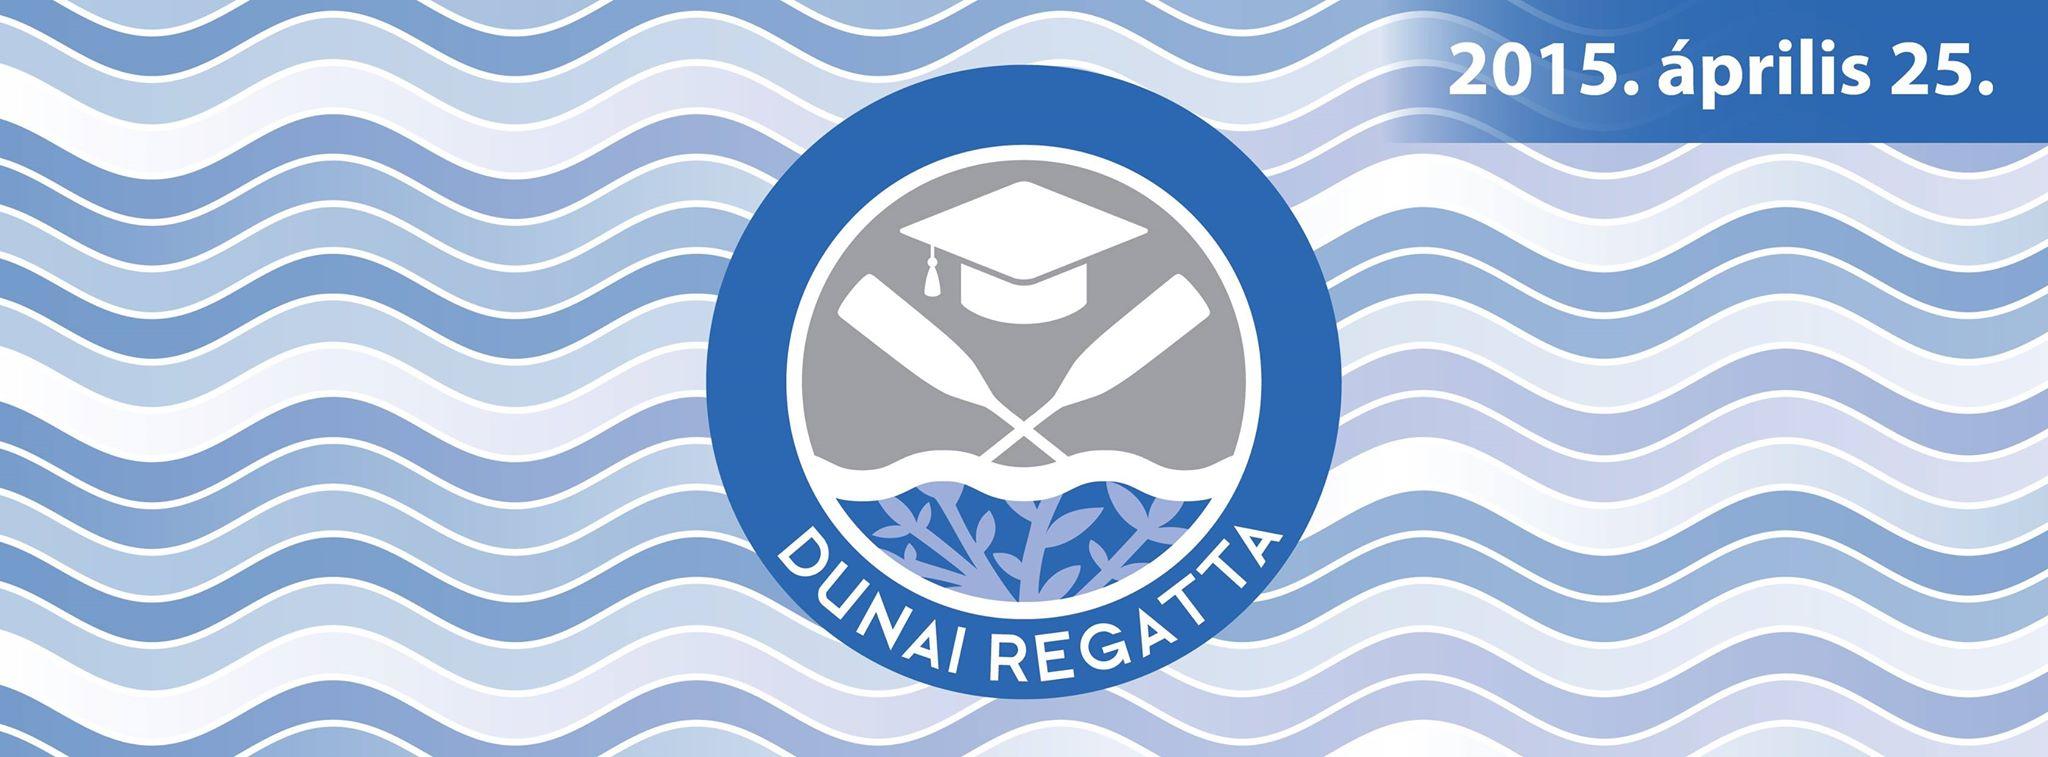 Dunai Regatta 2015